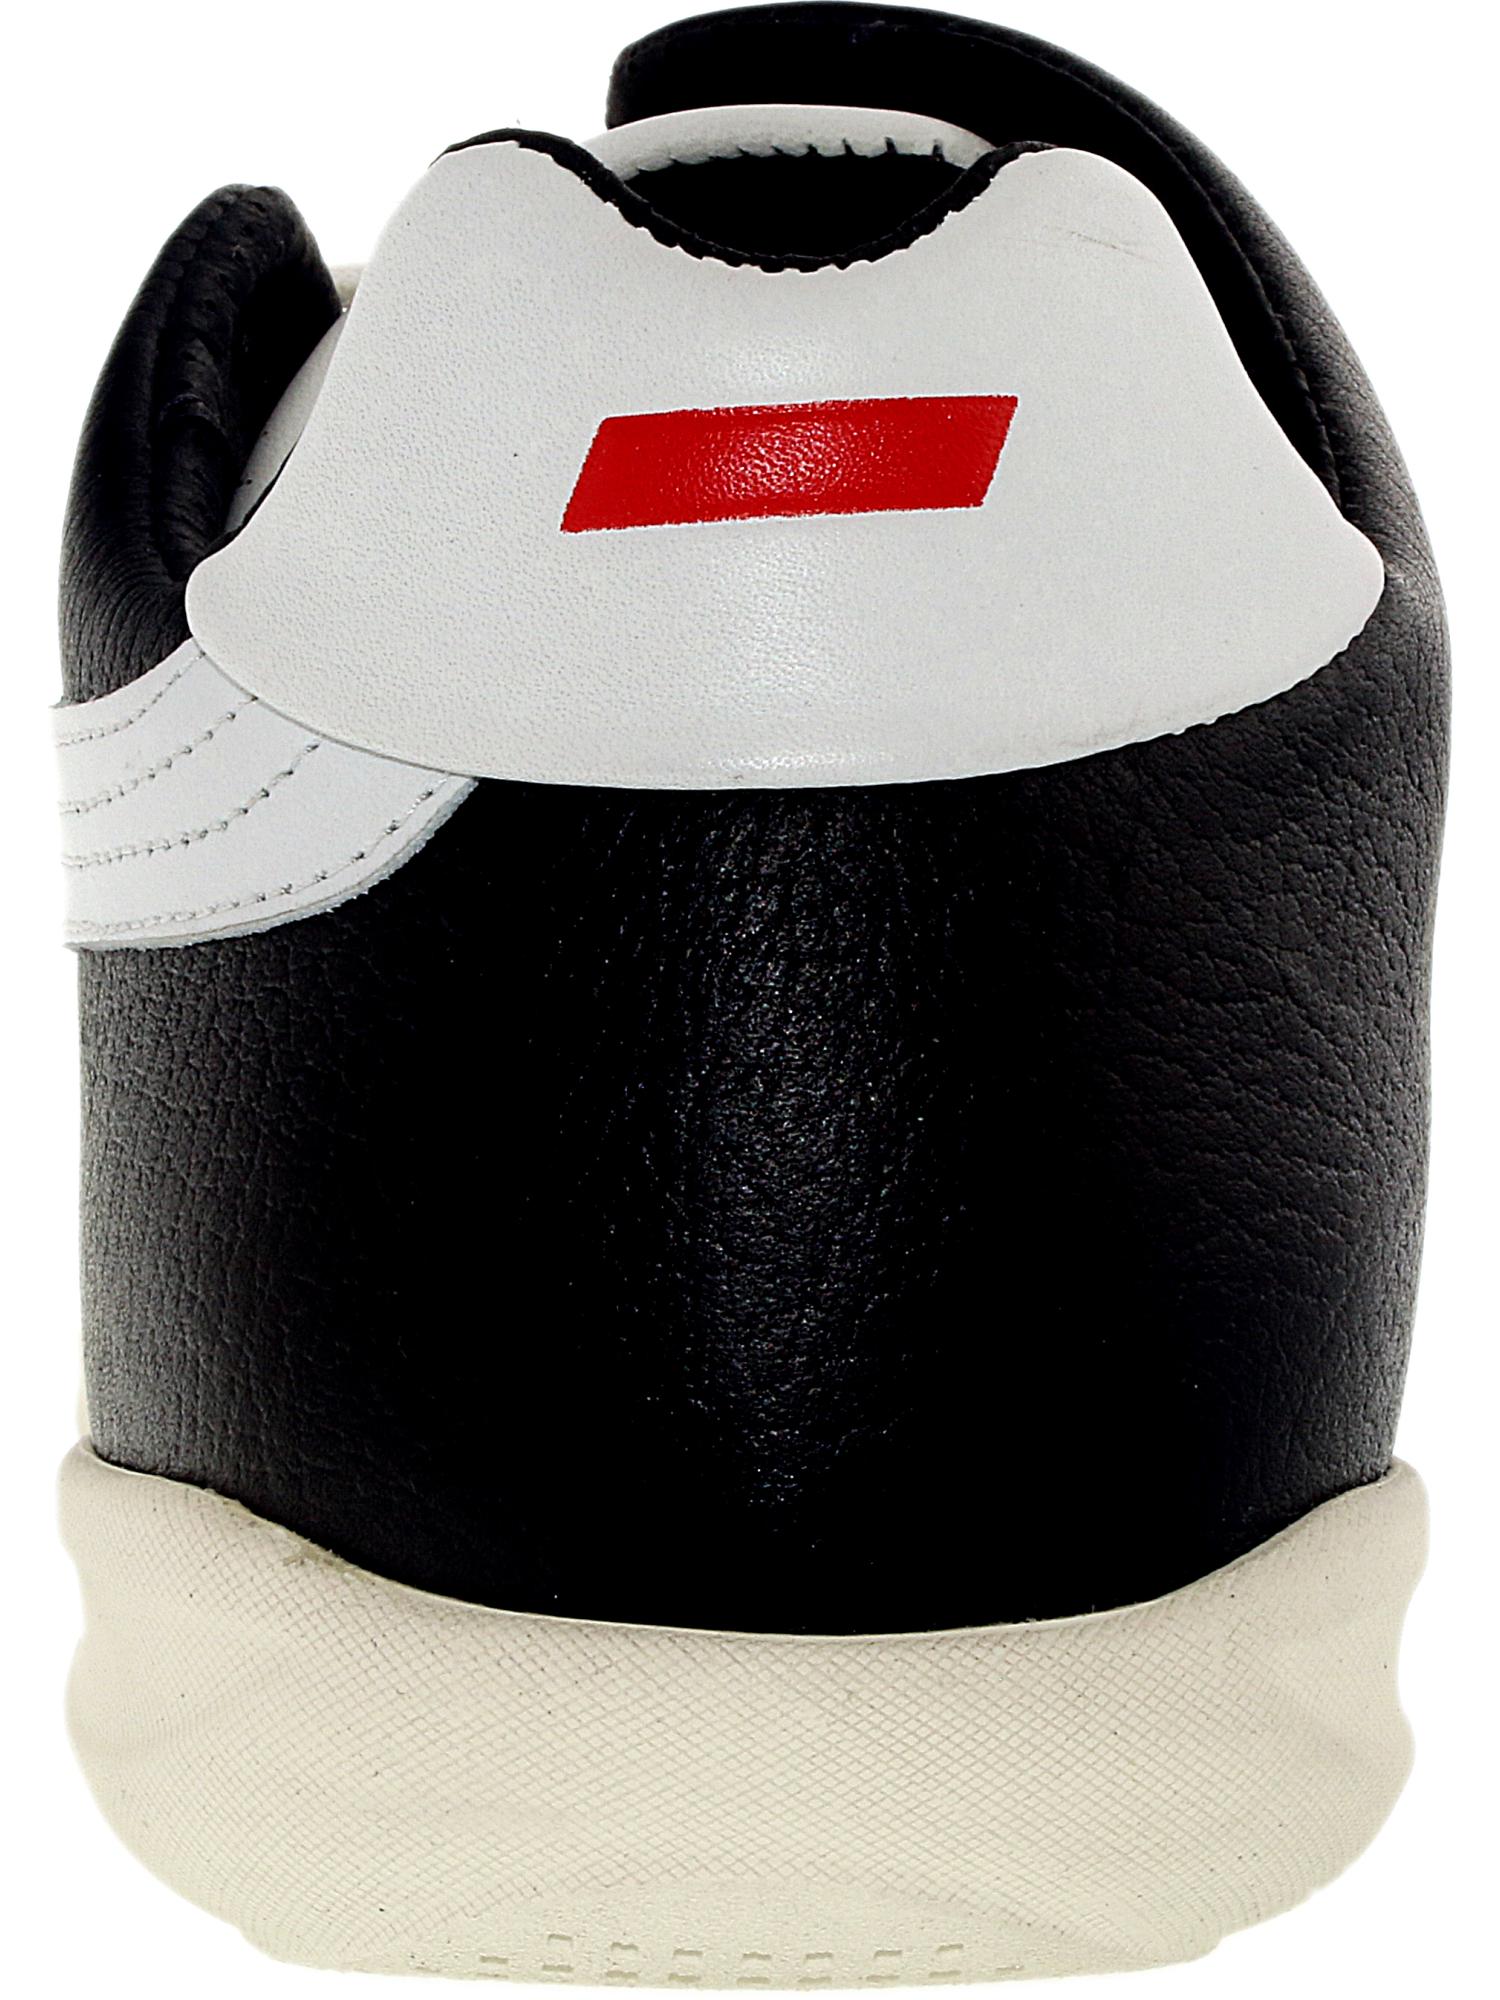 Puma Men/'s Future Cat Sf Premium 10 Ankle-High Tennis Shoe